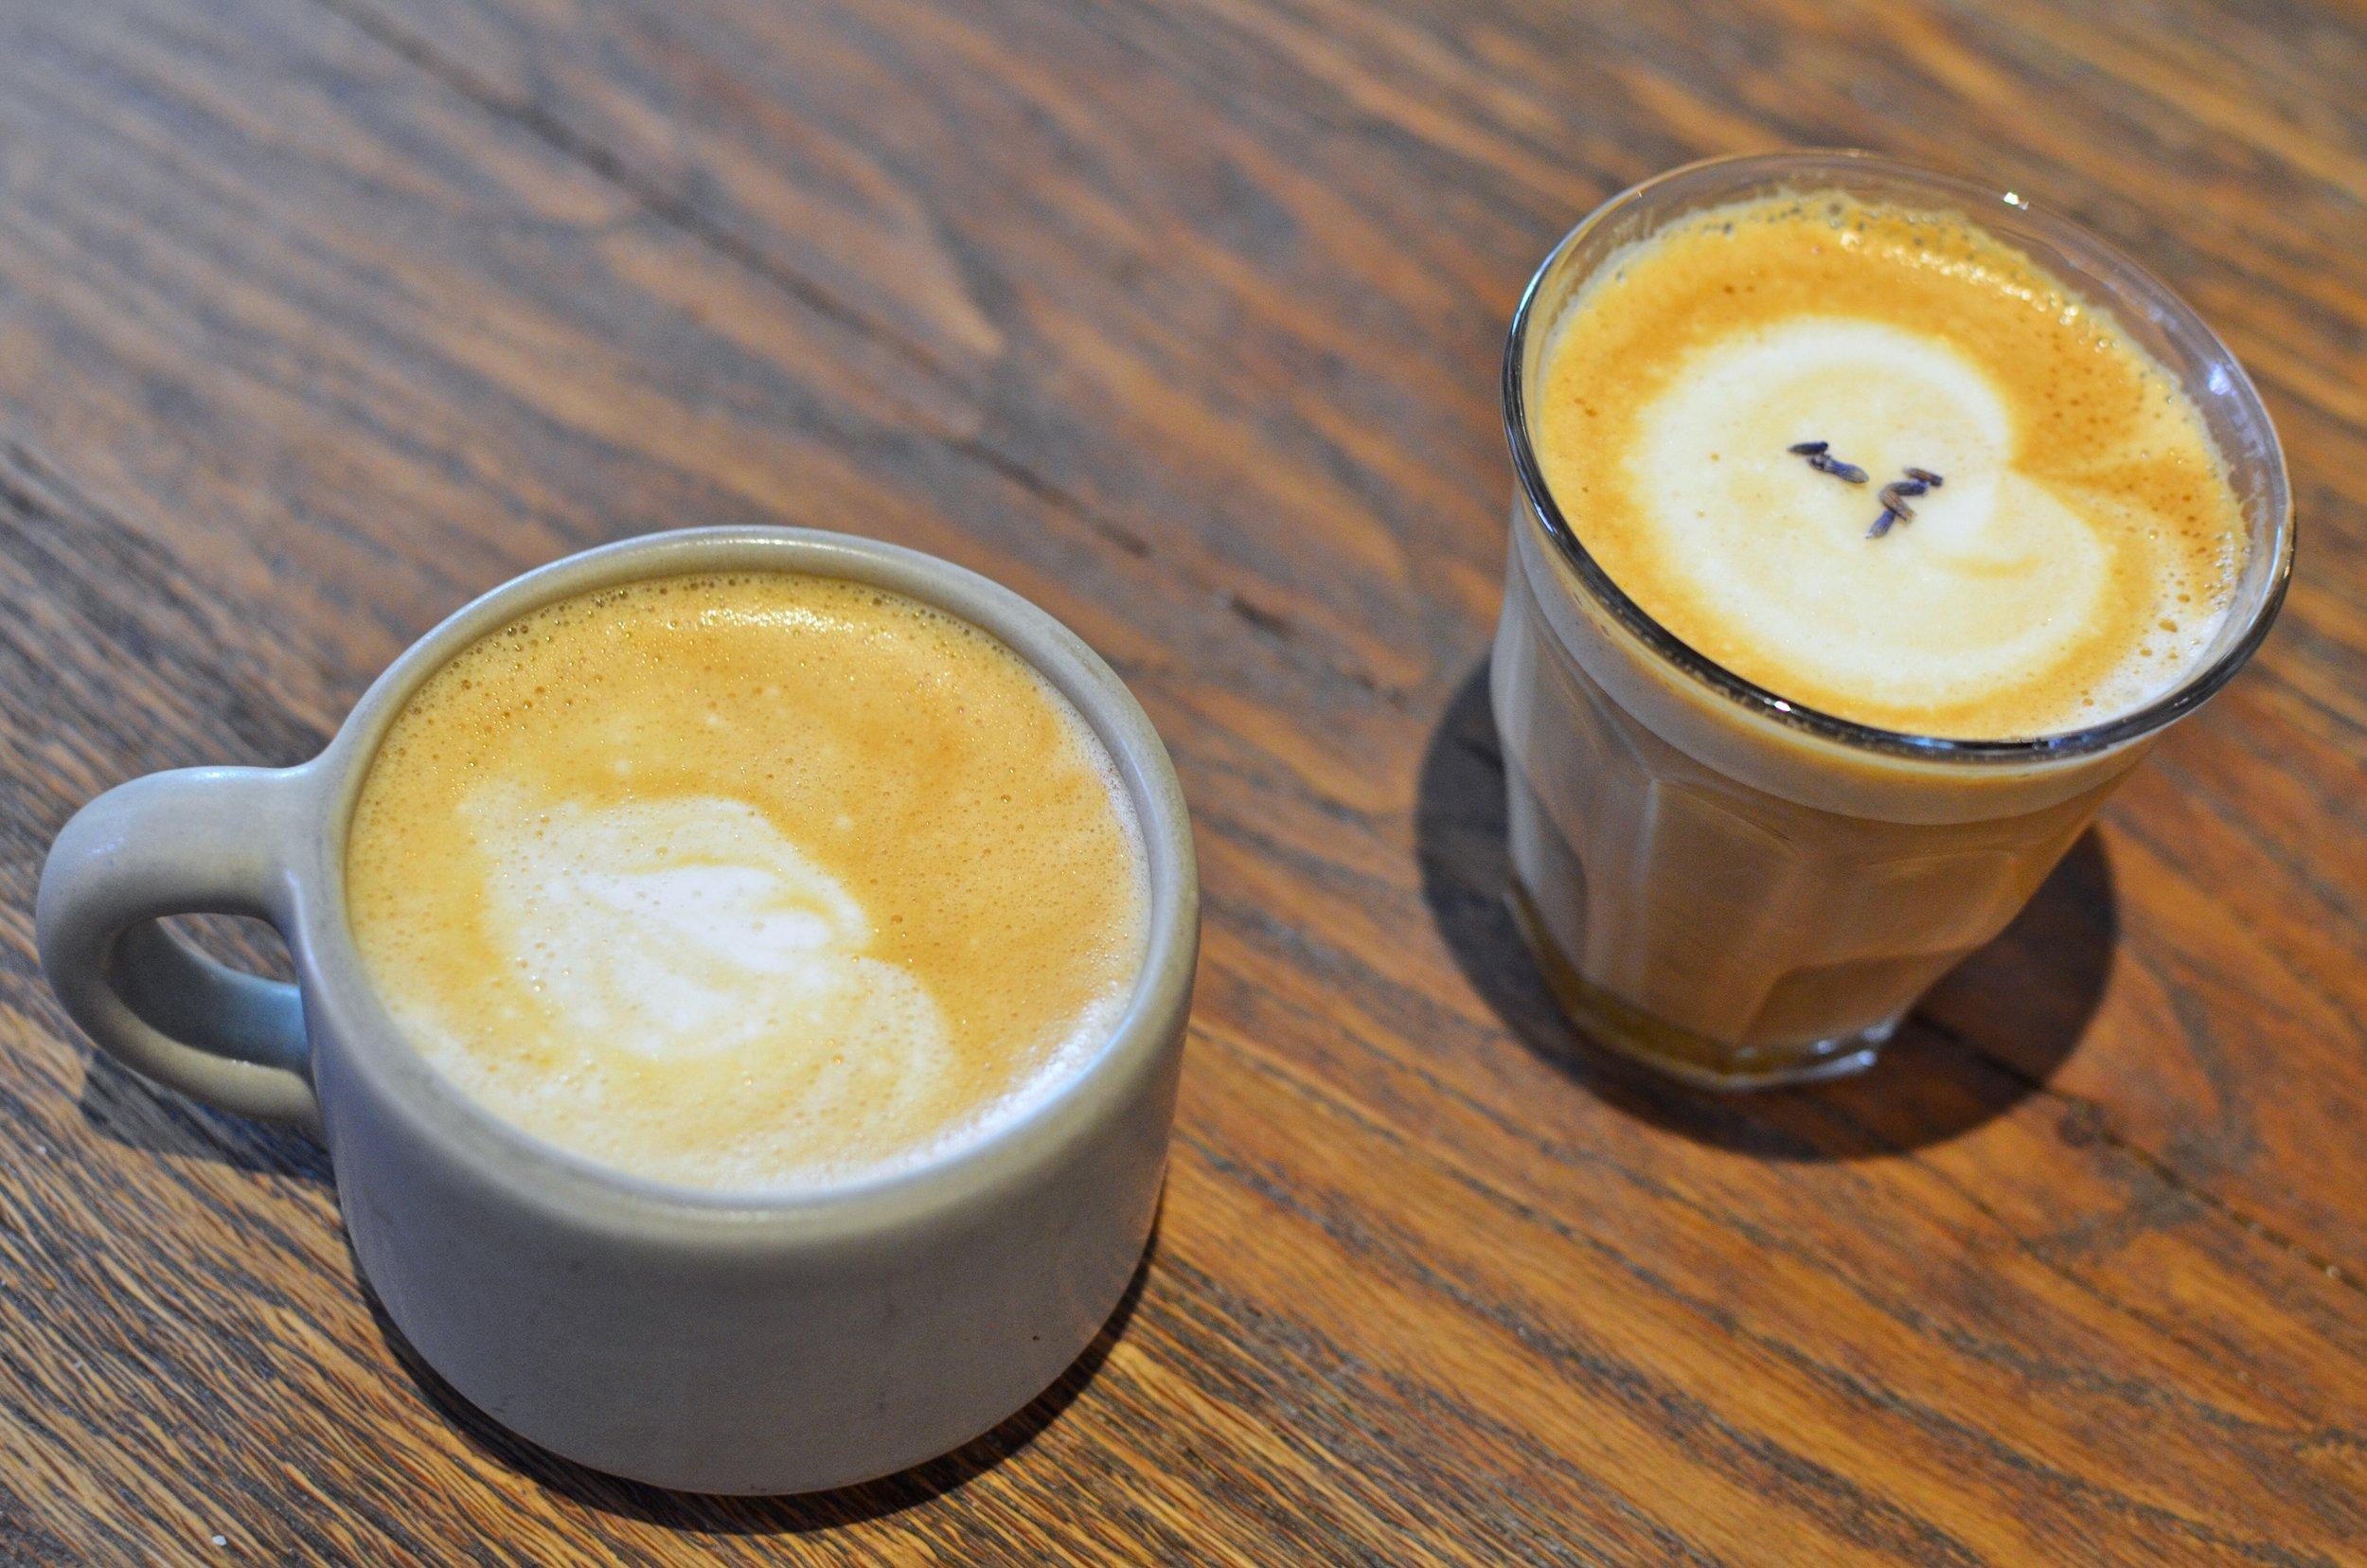 Cappuccino and cortado